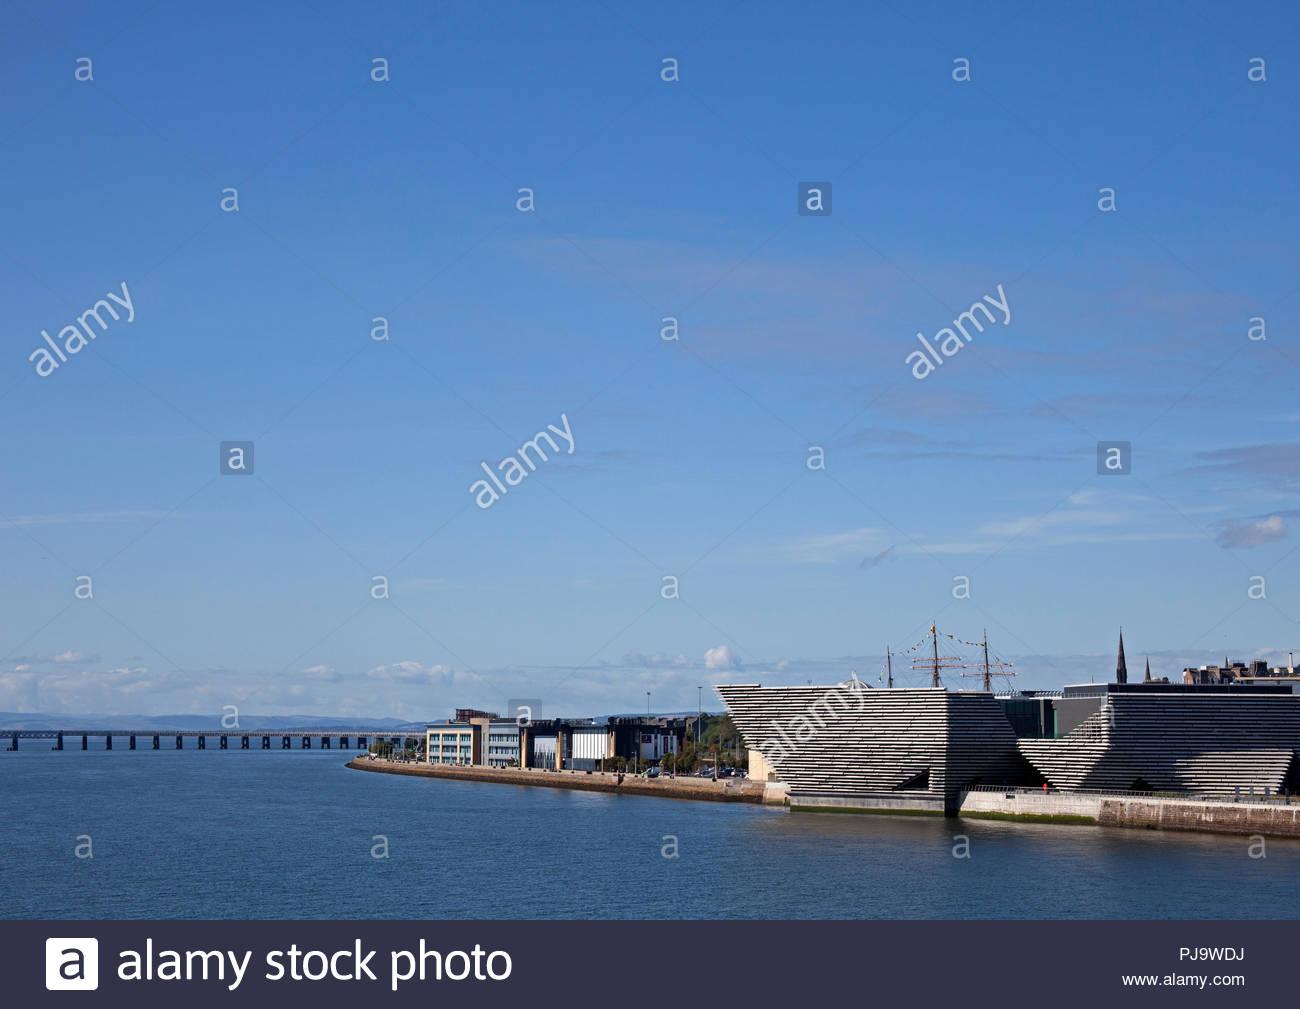 Dundee waterfront, Dundee city, Scotland, UK, Europe - Stock Image